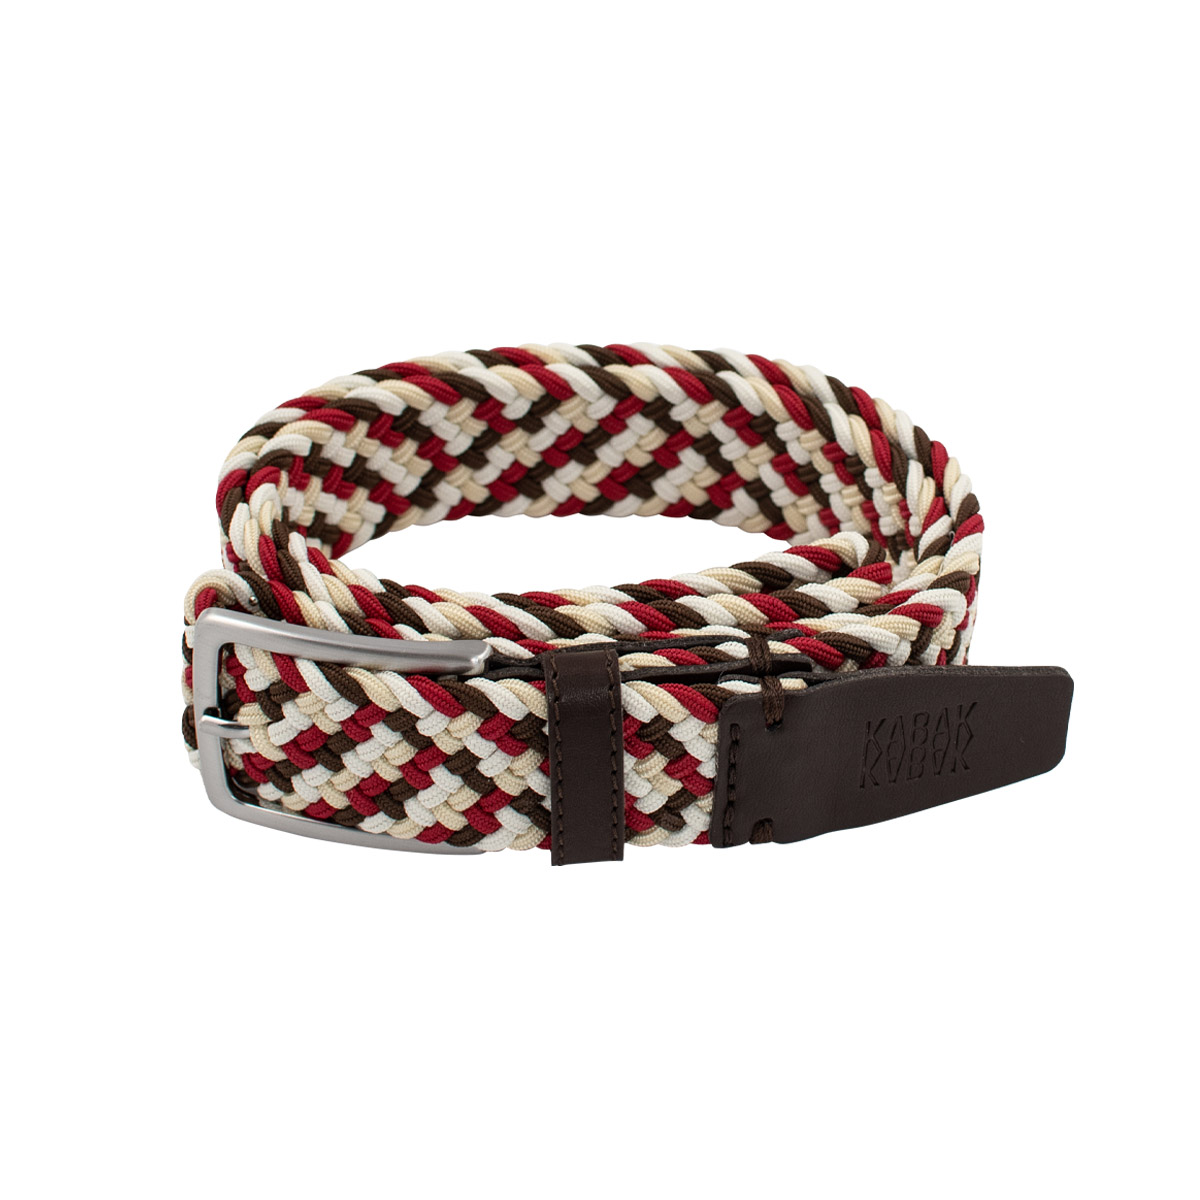 belt_woven_multicolor_C68_kabak_5903678202439